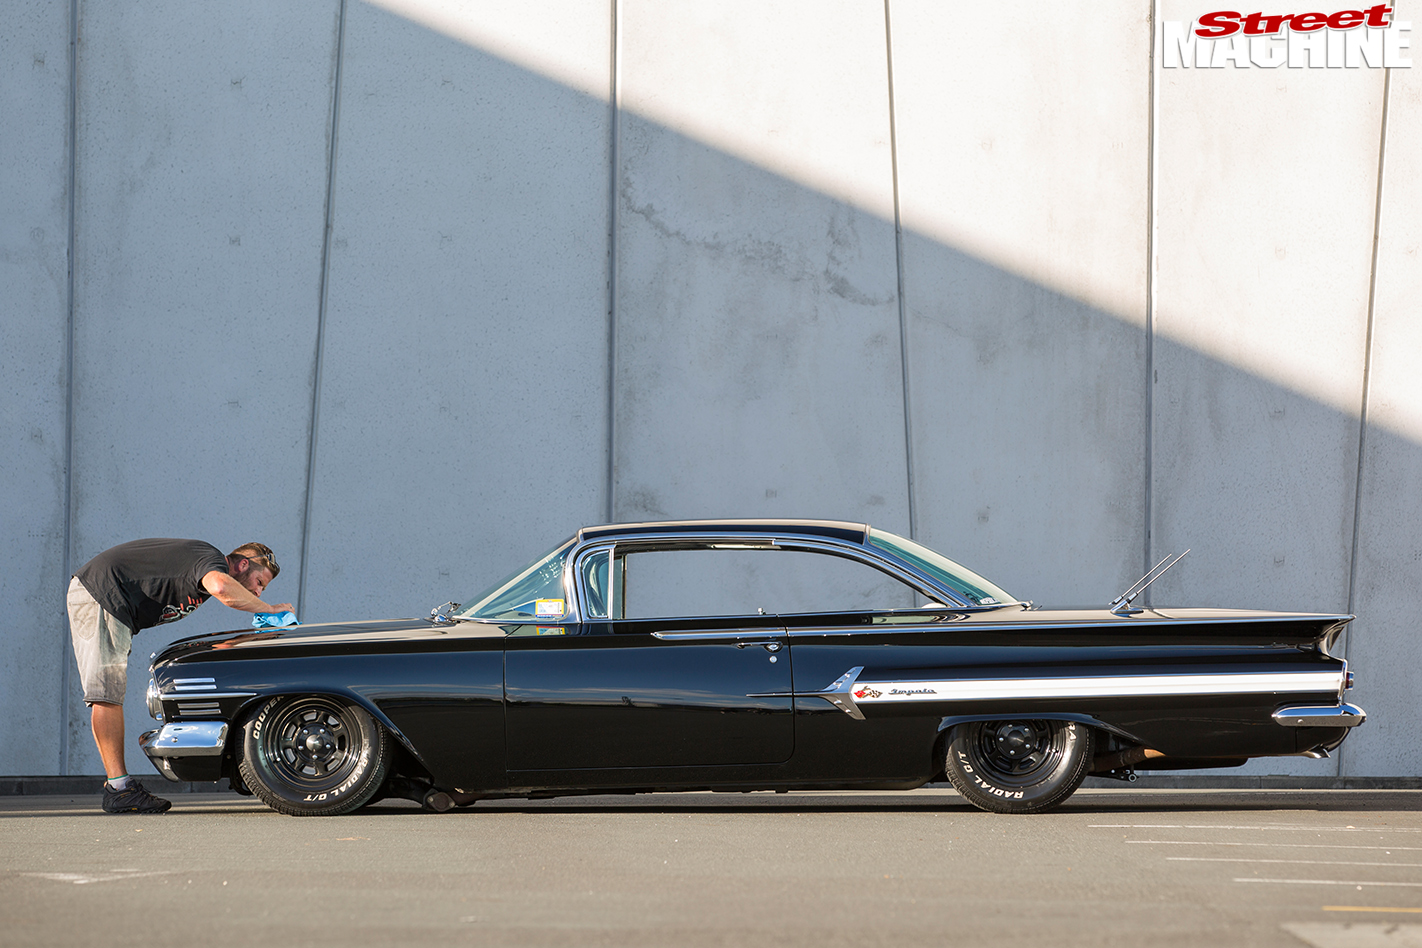 Chevrolet -impala -side -view